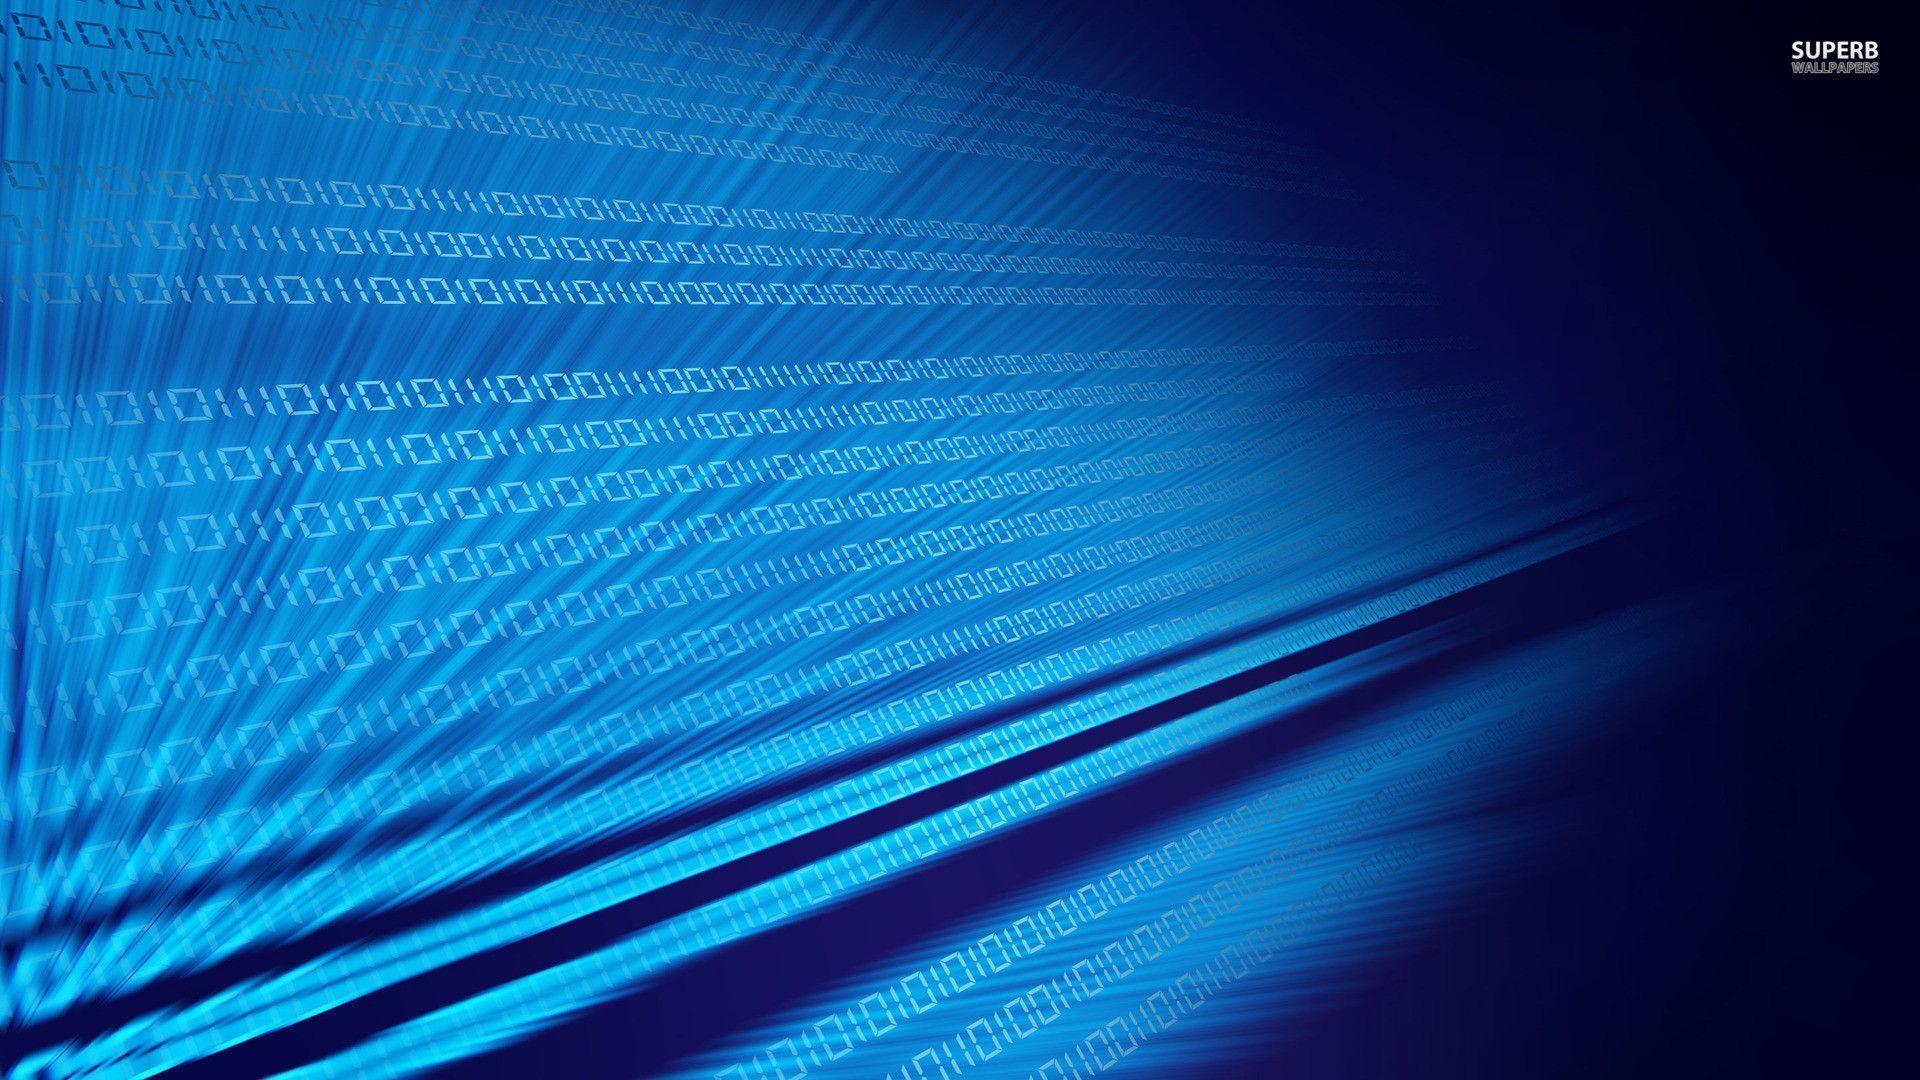 www chevron computer wallpaper - photo #42